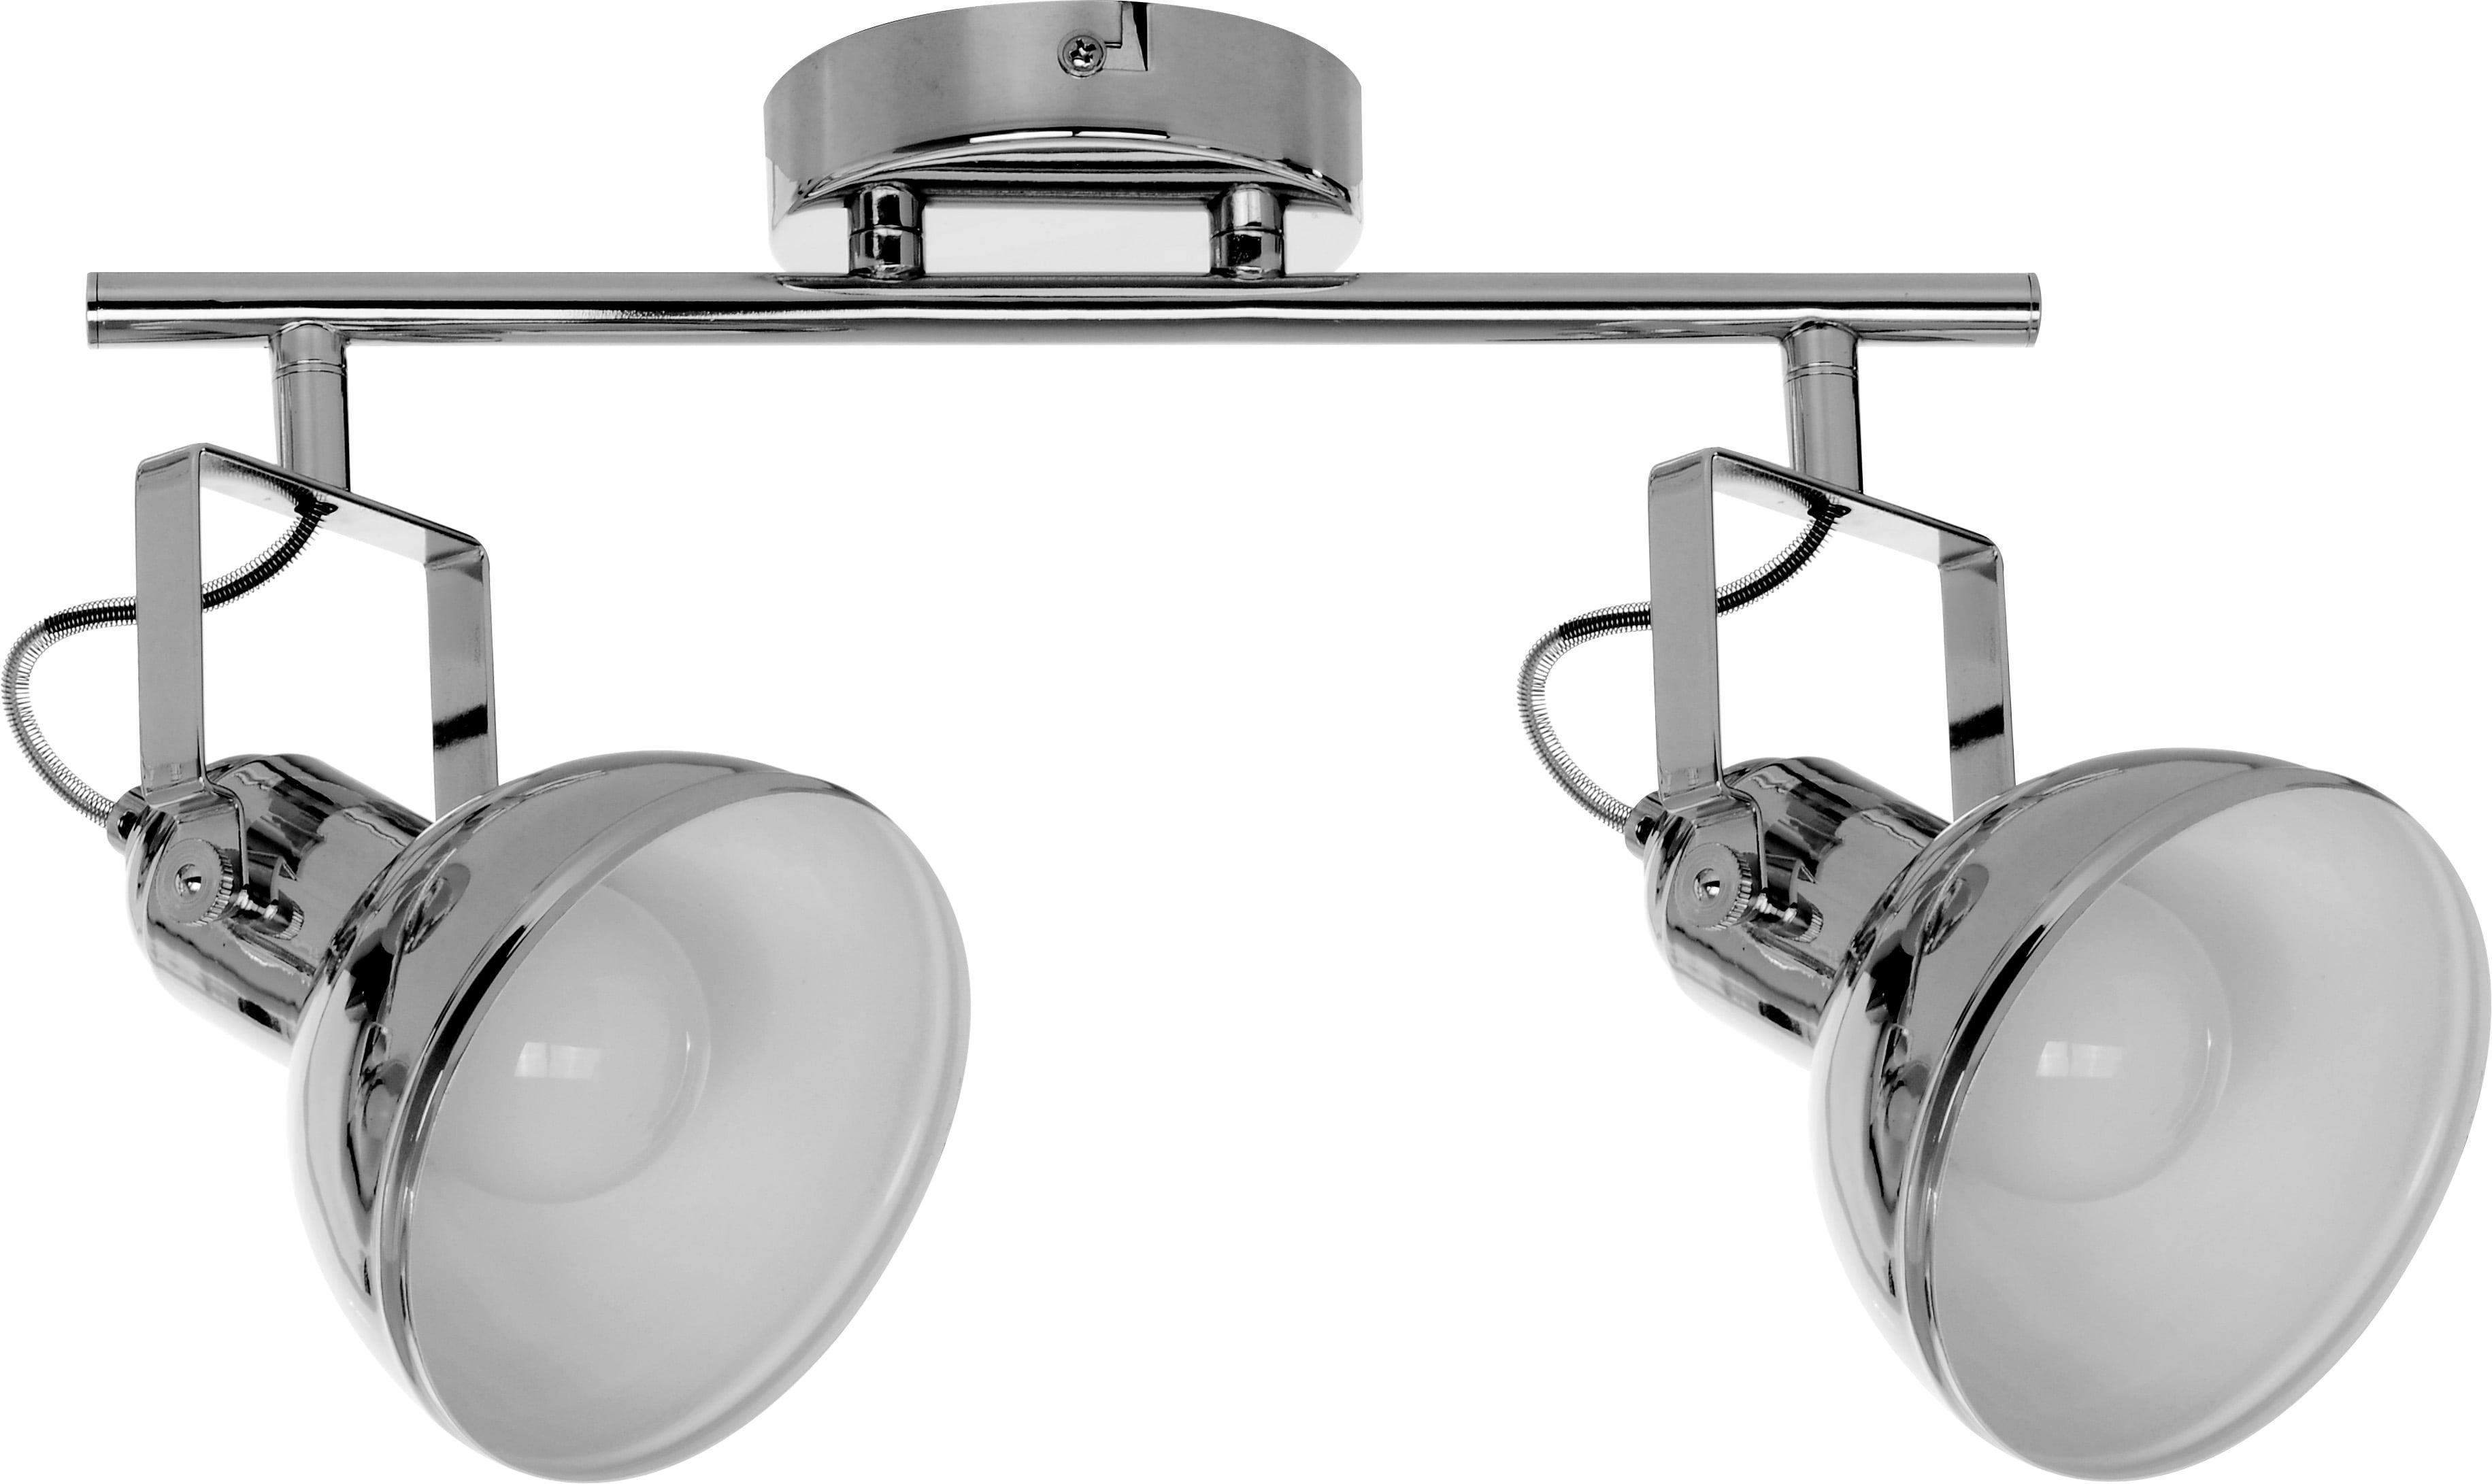 Ceiling Ceiling Wall Spotlights Chrome-plated Edit E27 60W